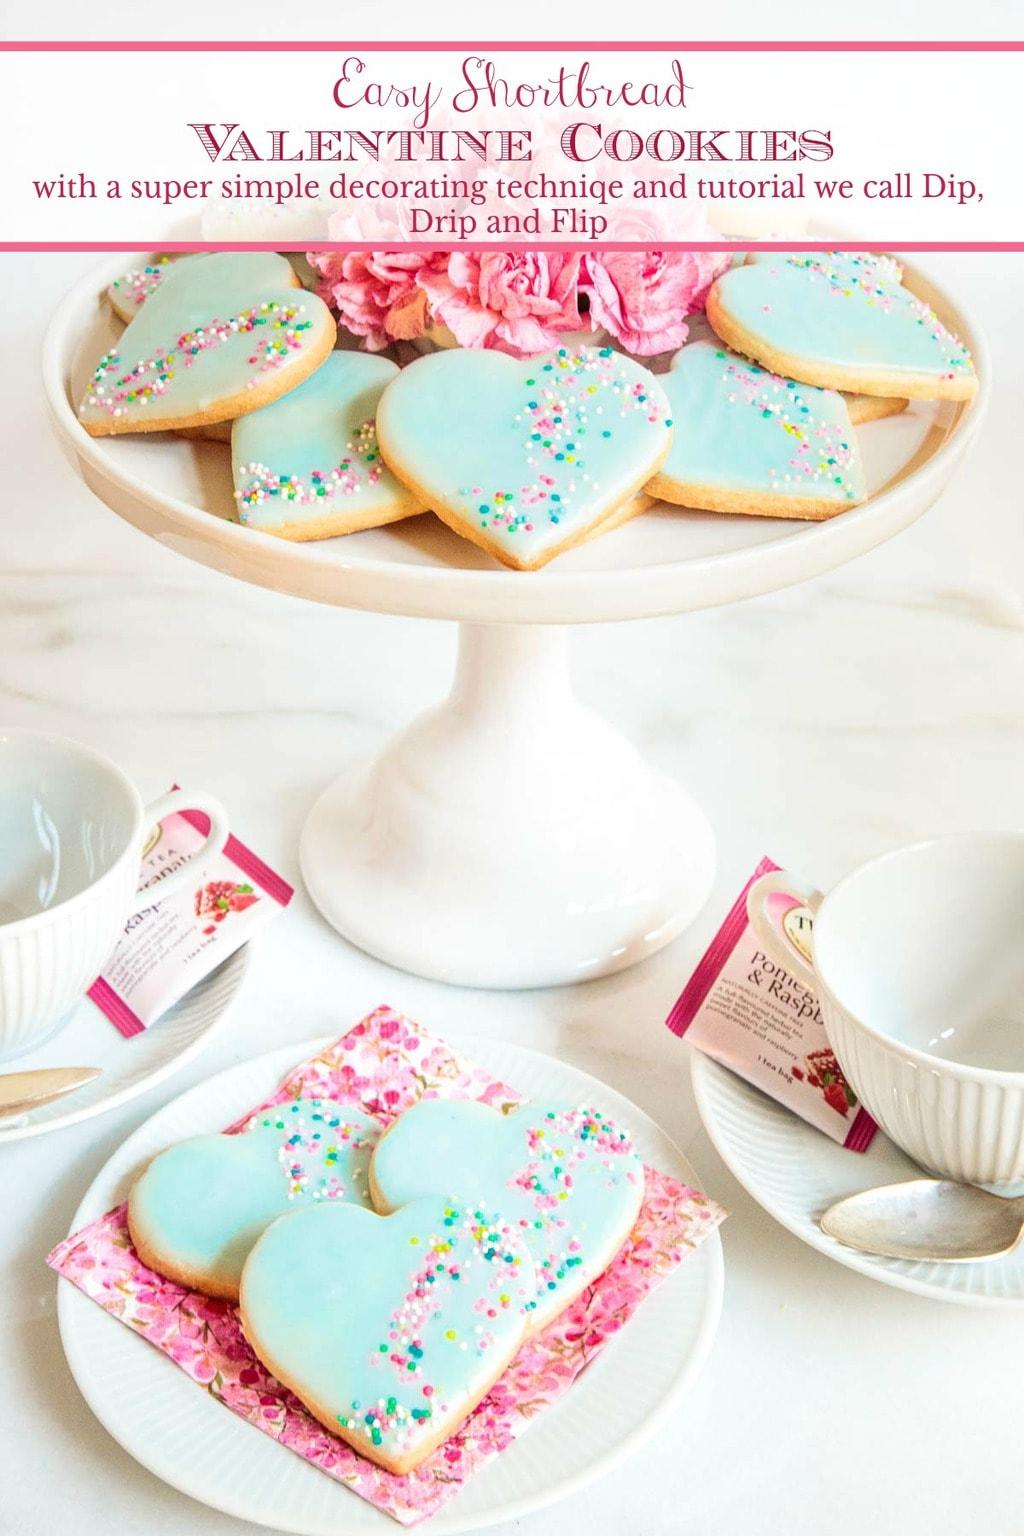 Dip, Drip and Flip Shortbread Valentine Cookies